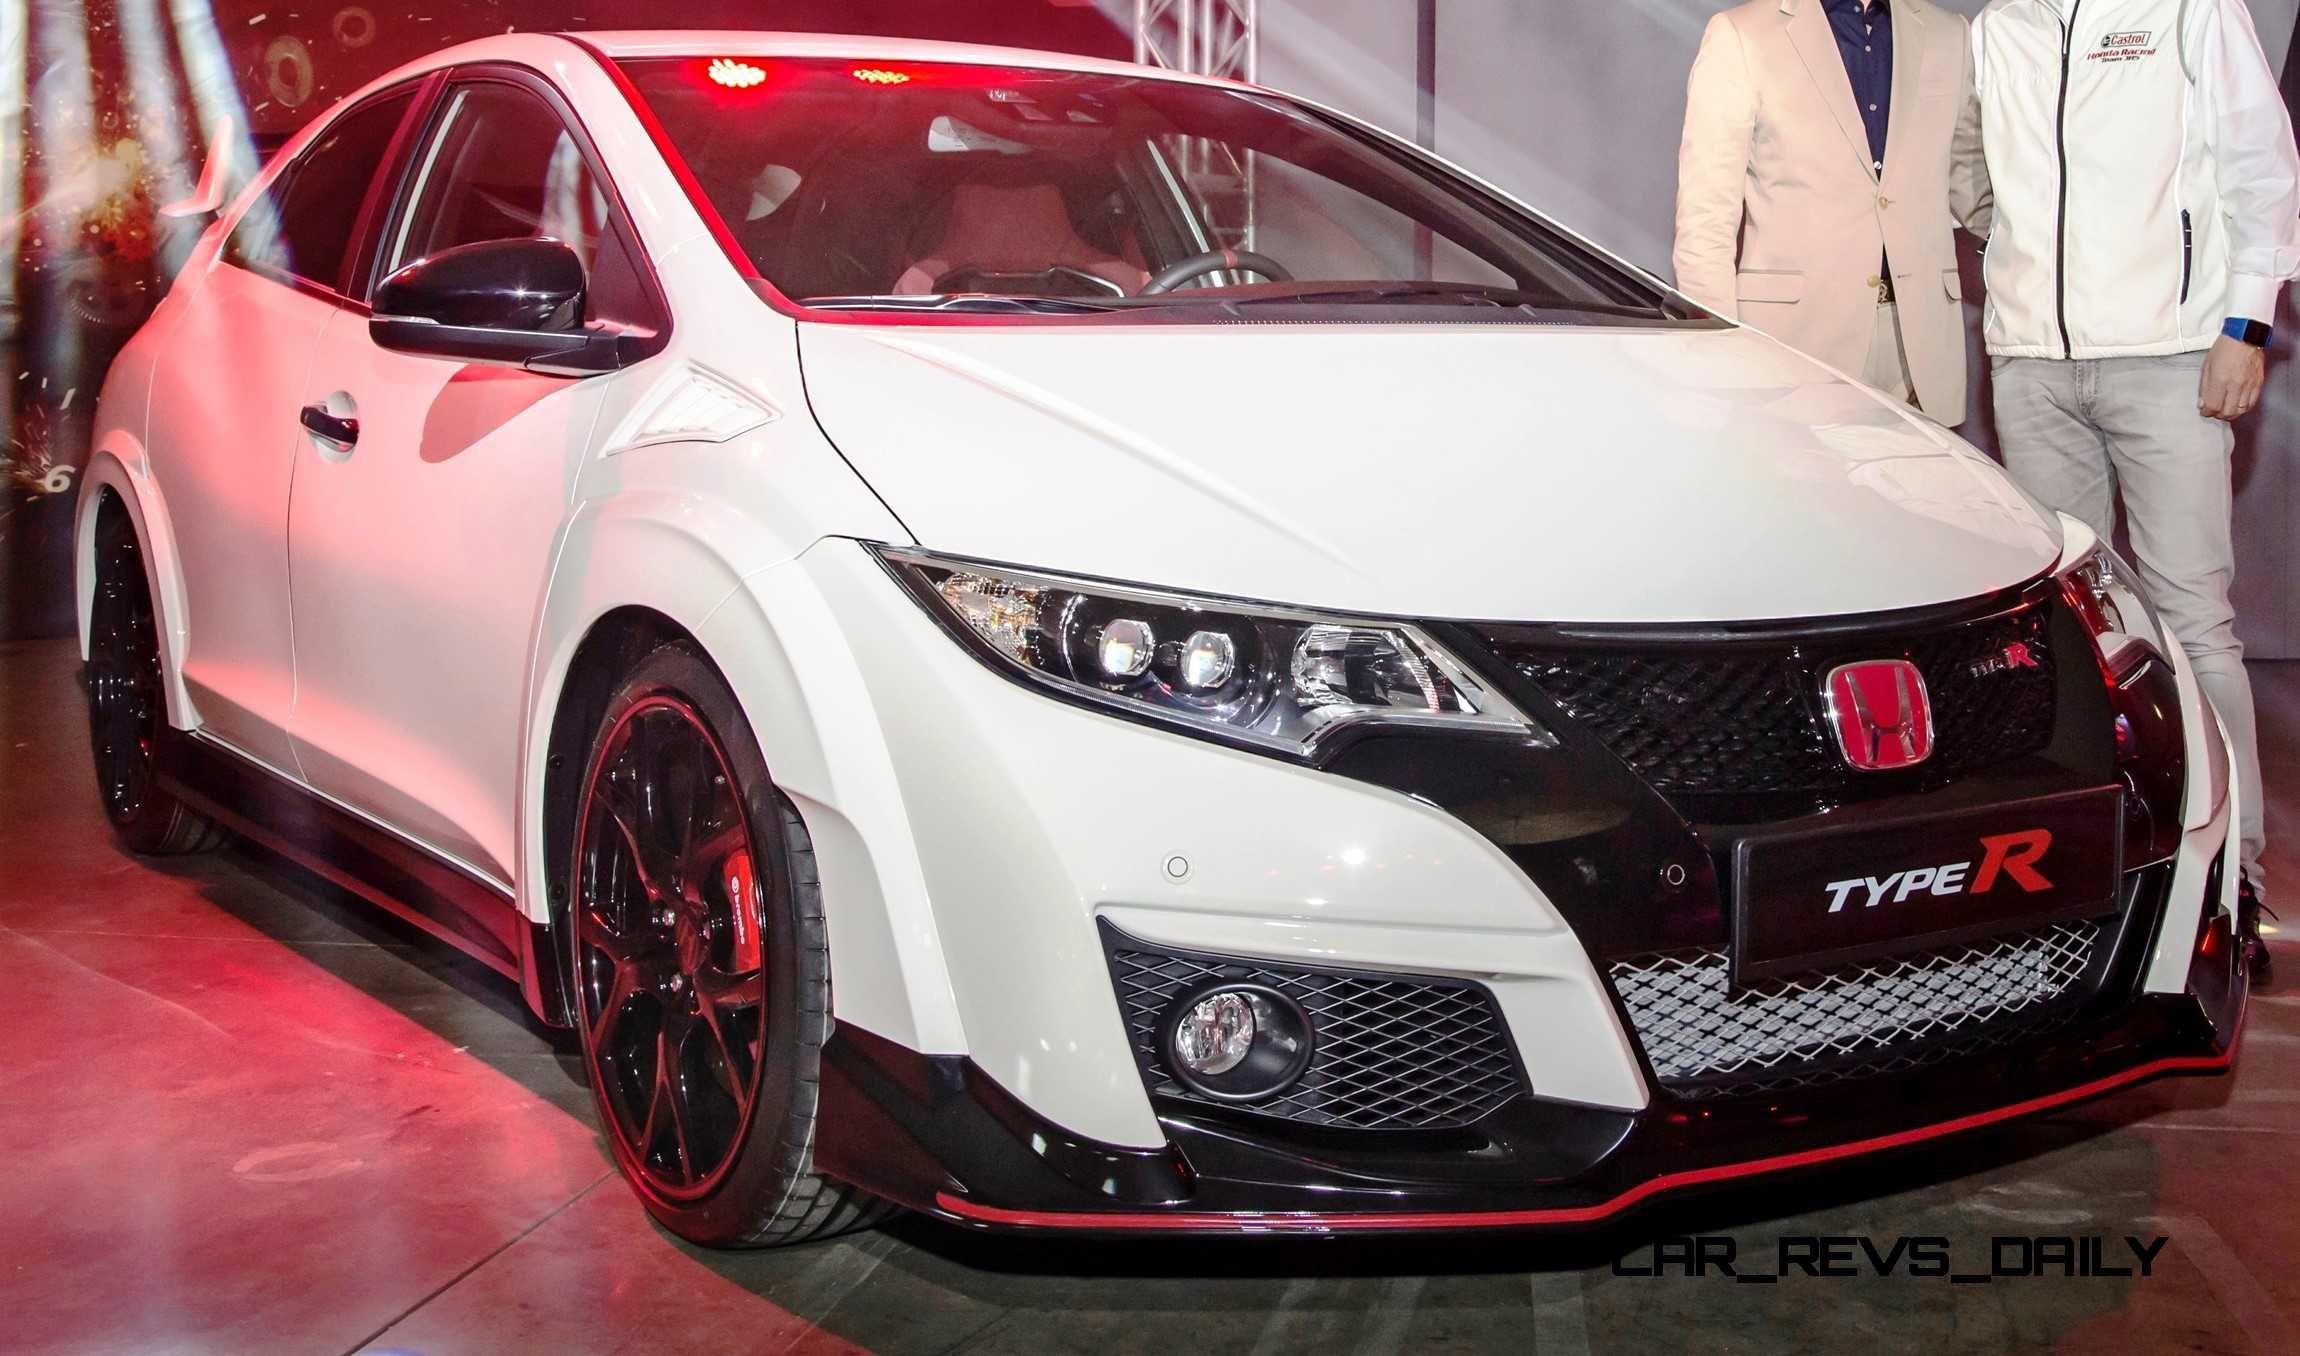 2015 Honda Civic Type R 2015 honda civic, Honda civic